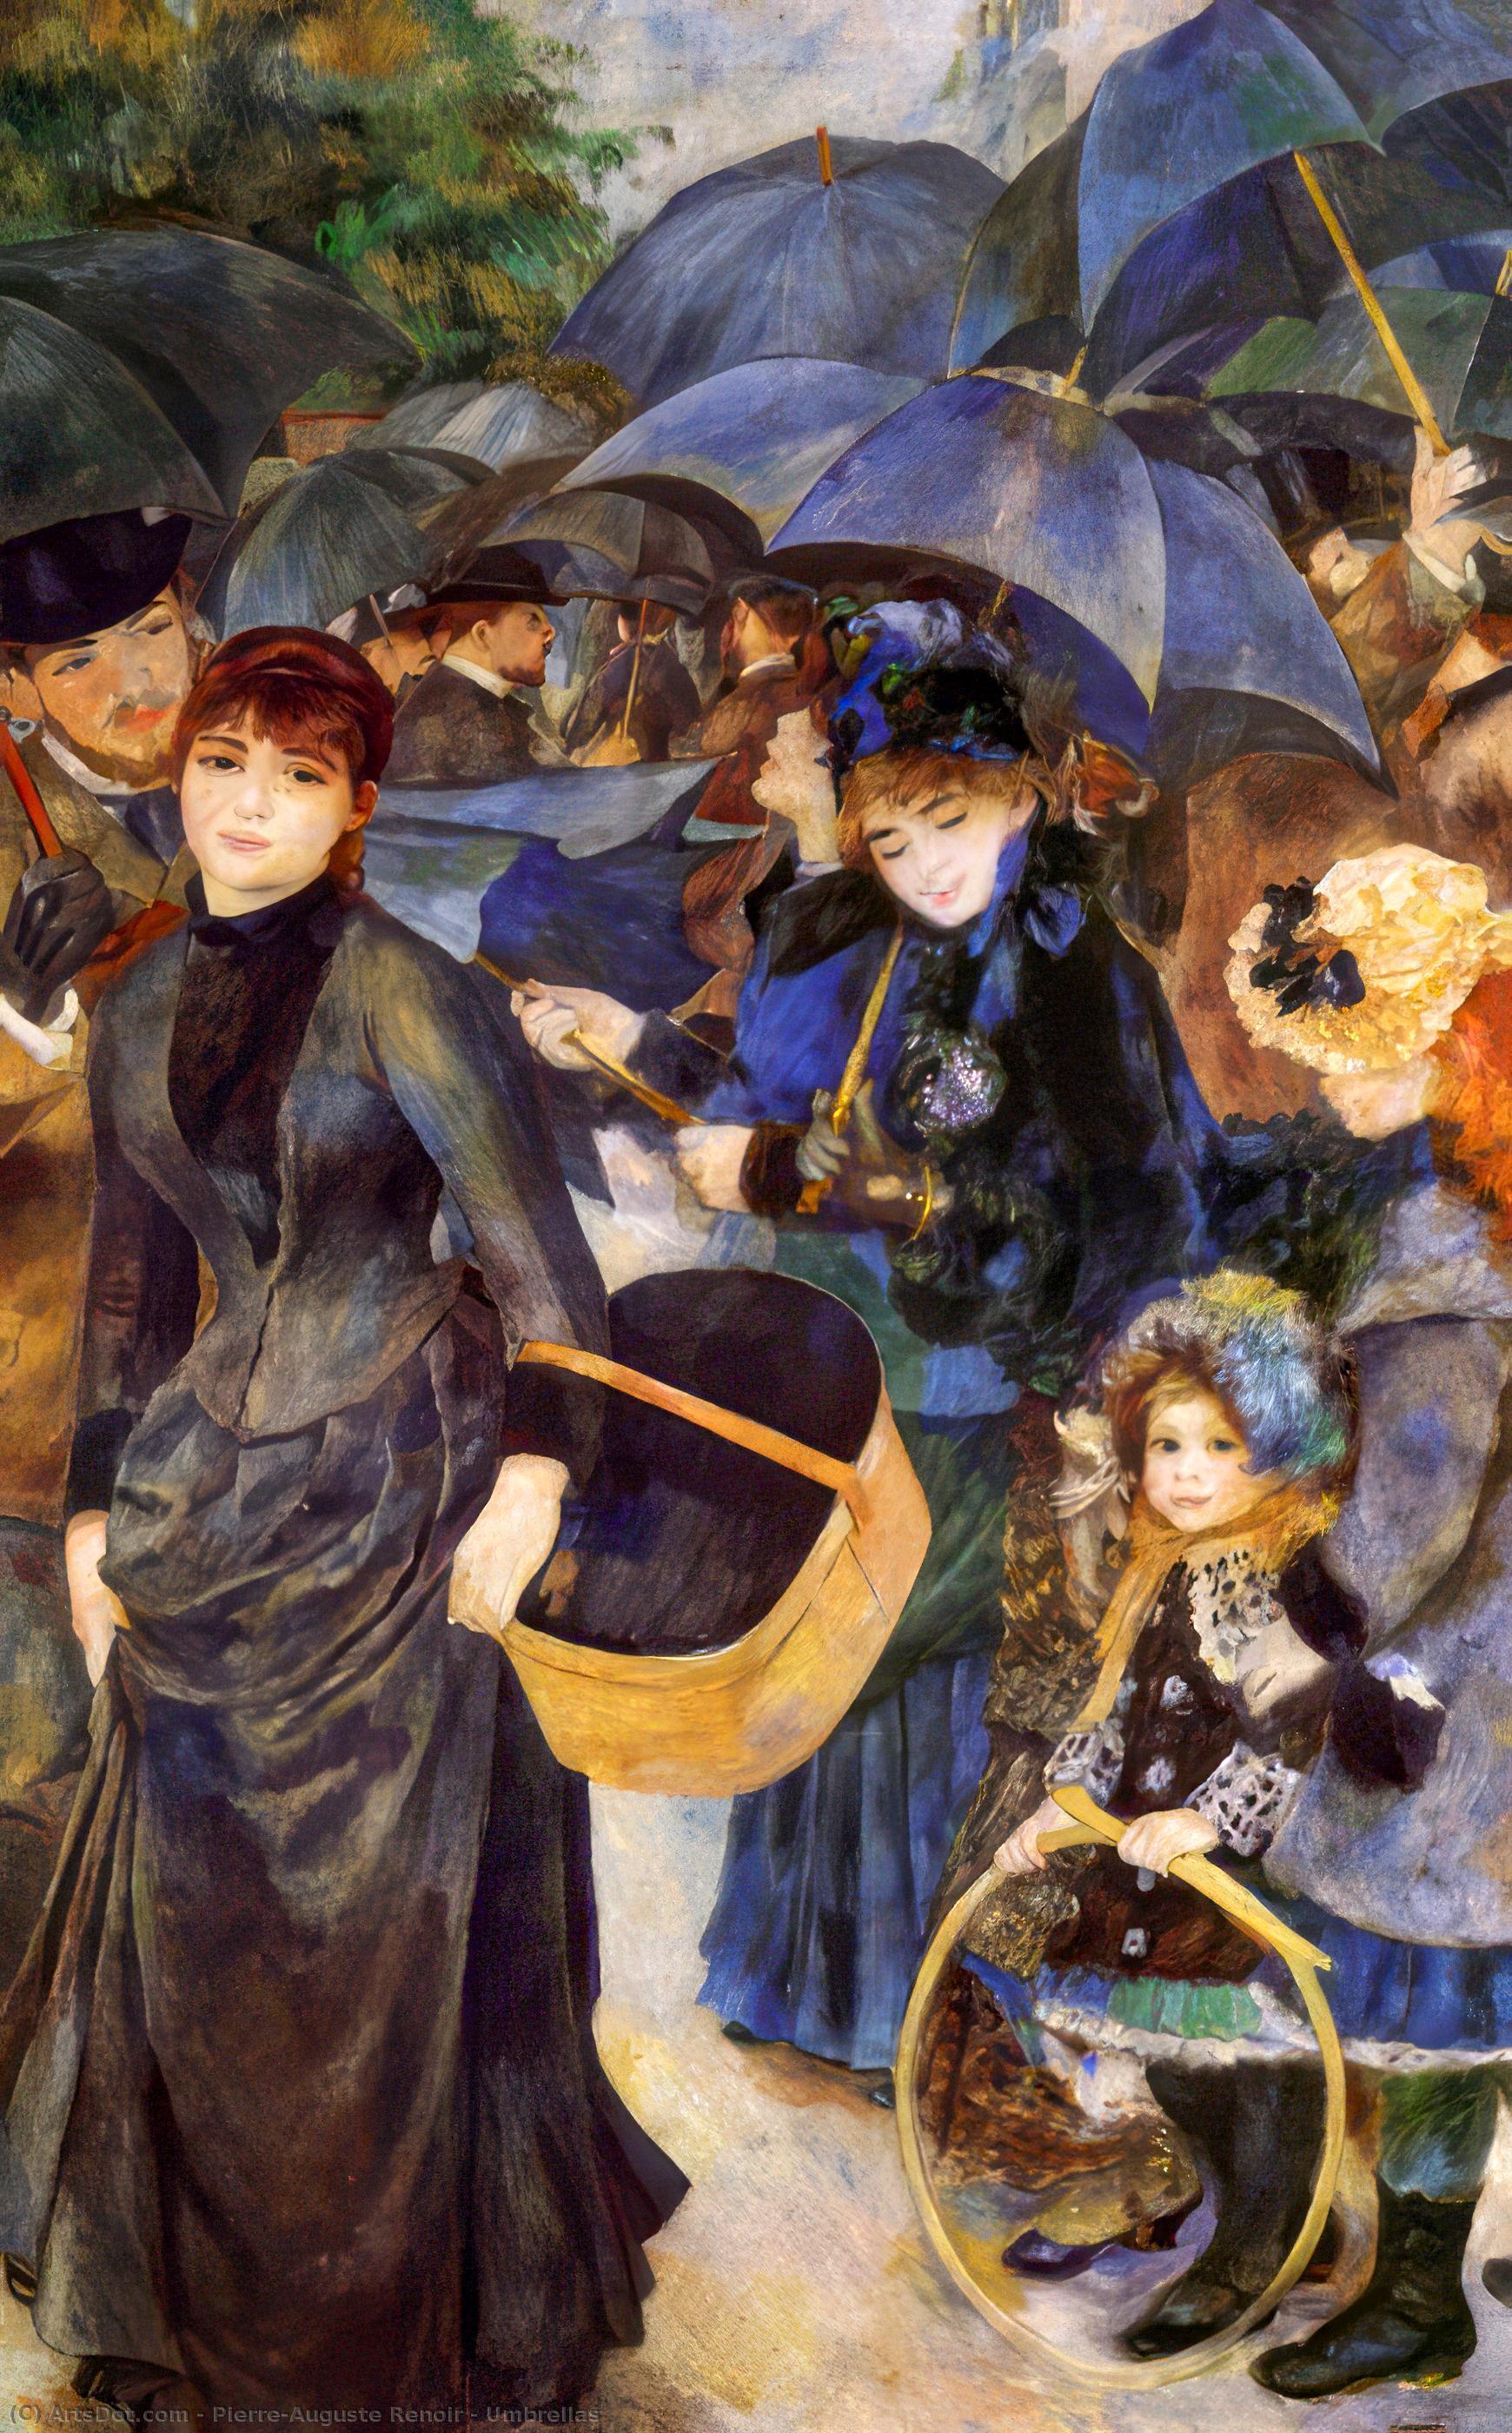 Wikioo.org - The Encyclopedia of Fine Arts - Painting, Artwork by Pierre-Auguste Renoir - Umbrellas